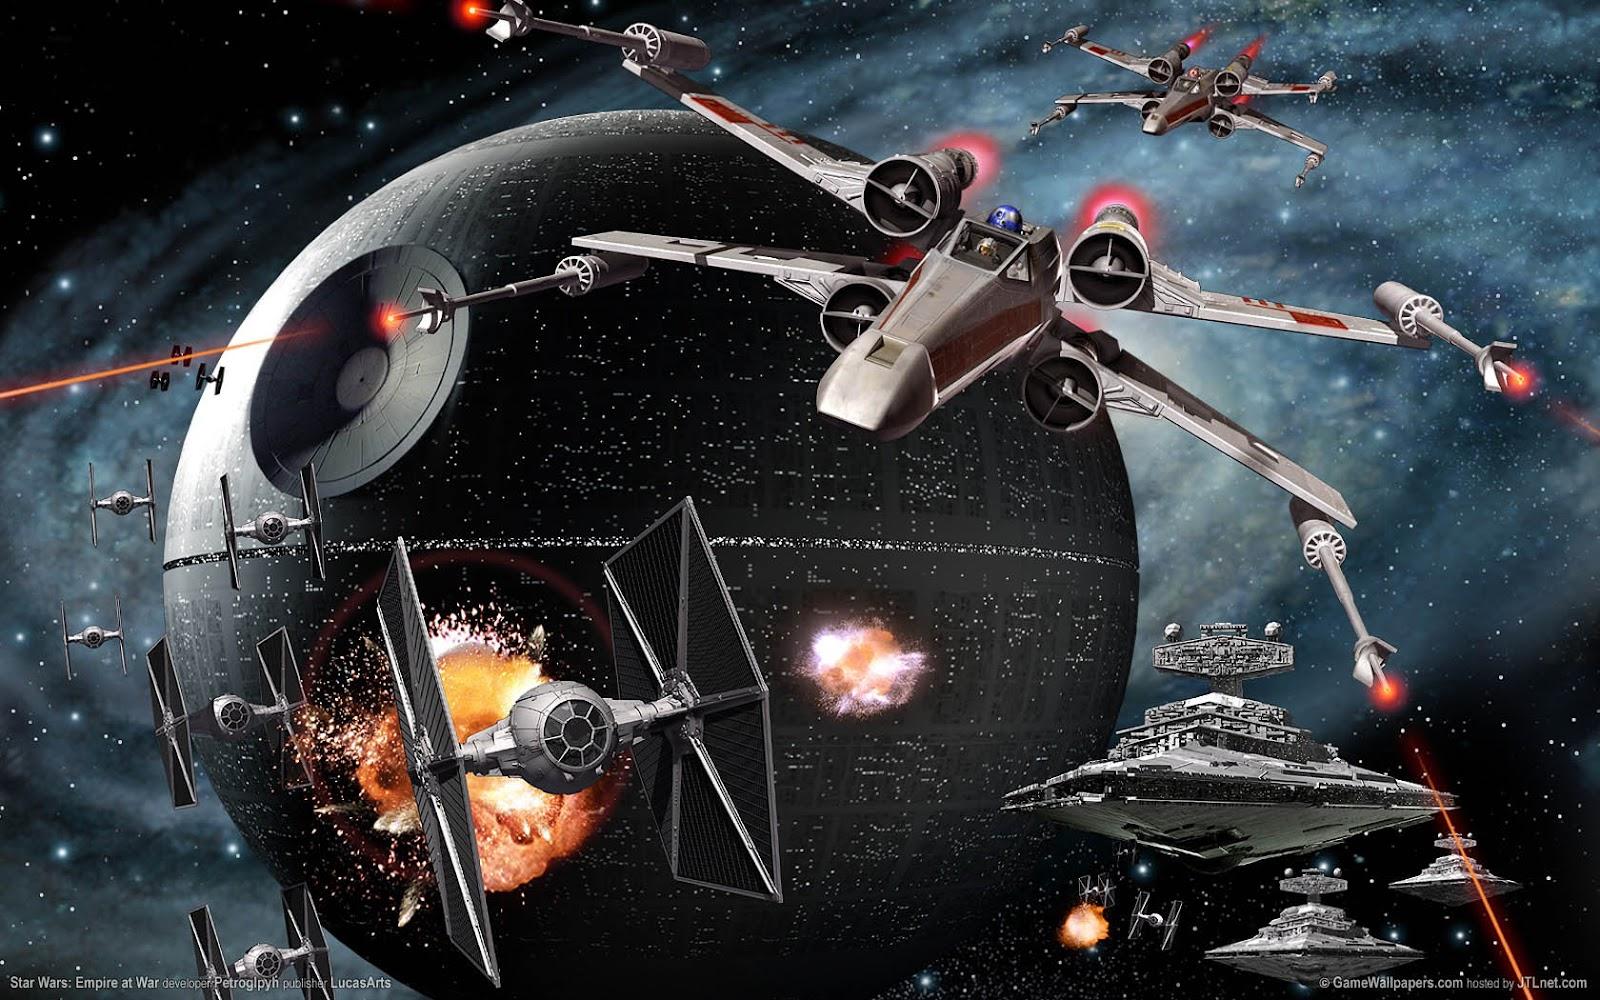 http://2.bp.blogspot.com/-aQg0c1SWsio/TvwVznBYBhI/AAAAAAAAR4U/w22fdMygPkA/s1600/wallpaper_star_wars_empire_at_war_05_1680x1050.jpg